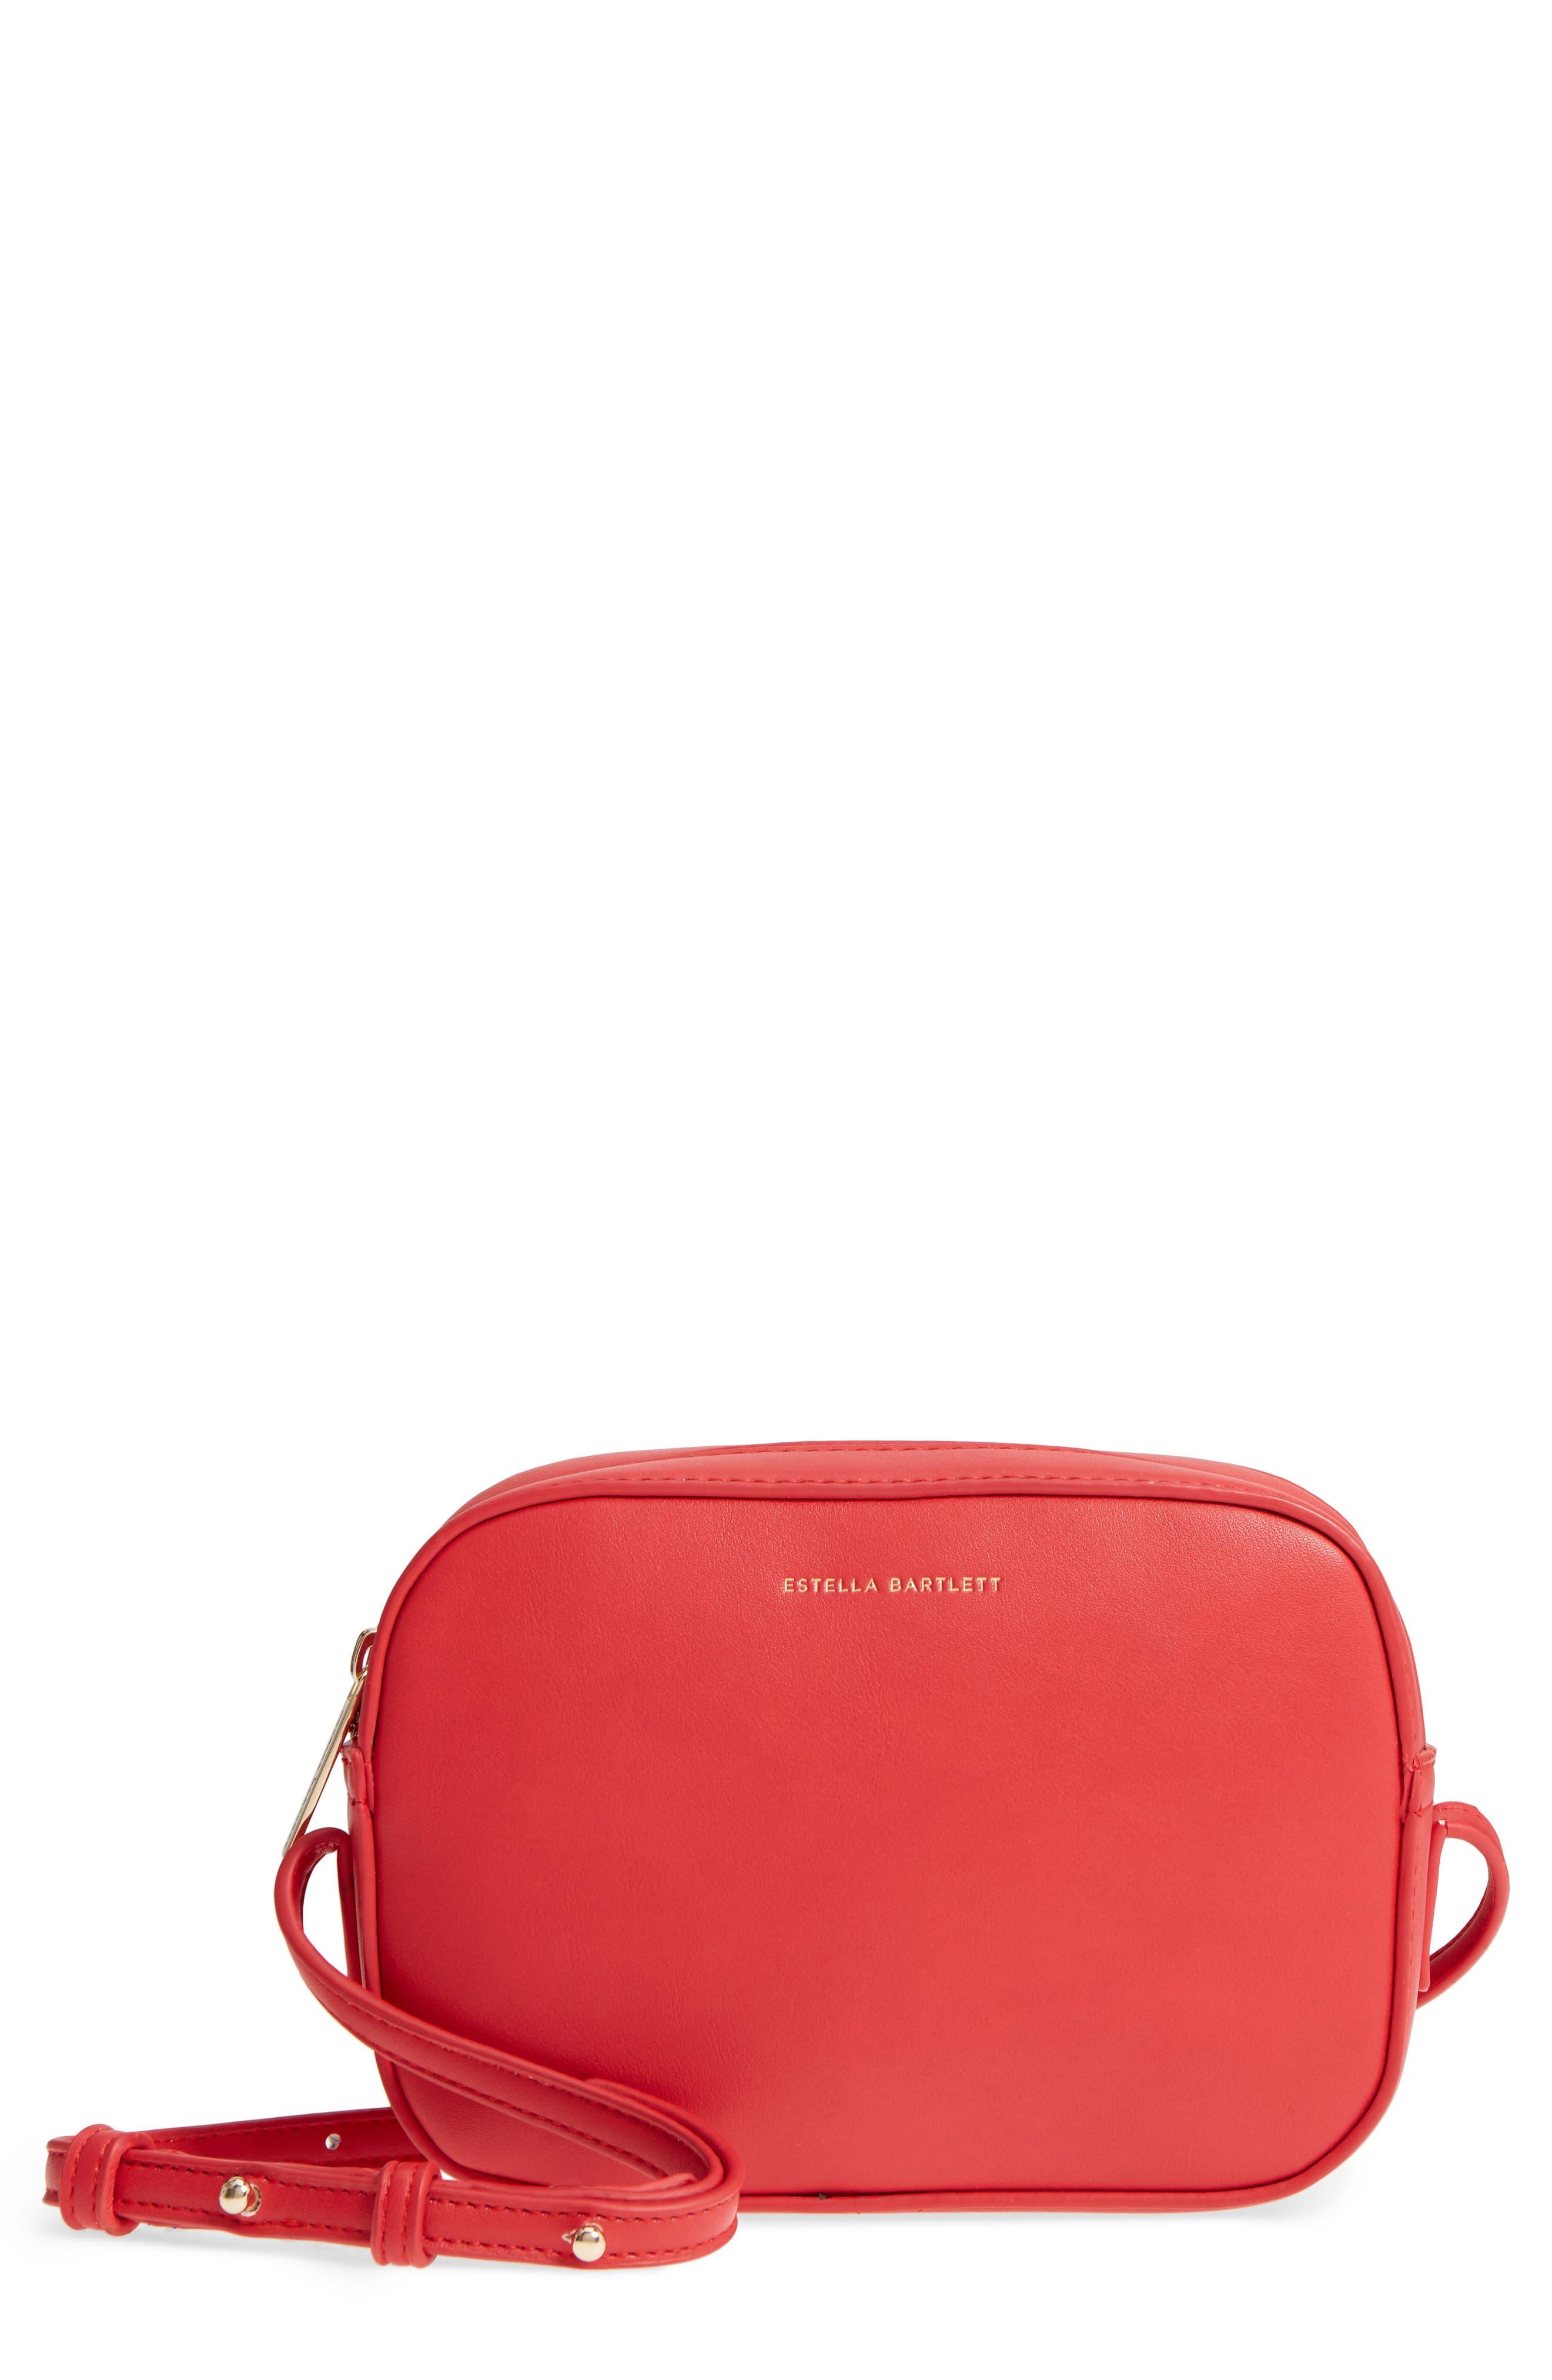 Estella Bartlett Faux Leather Box Bag